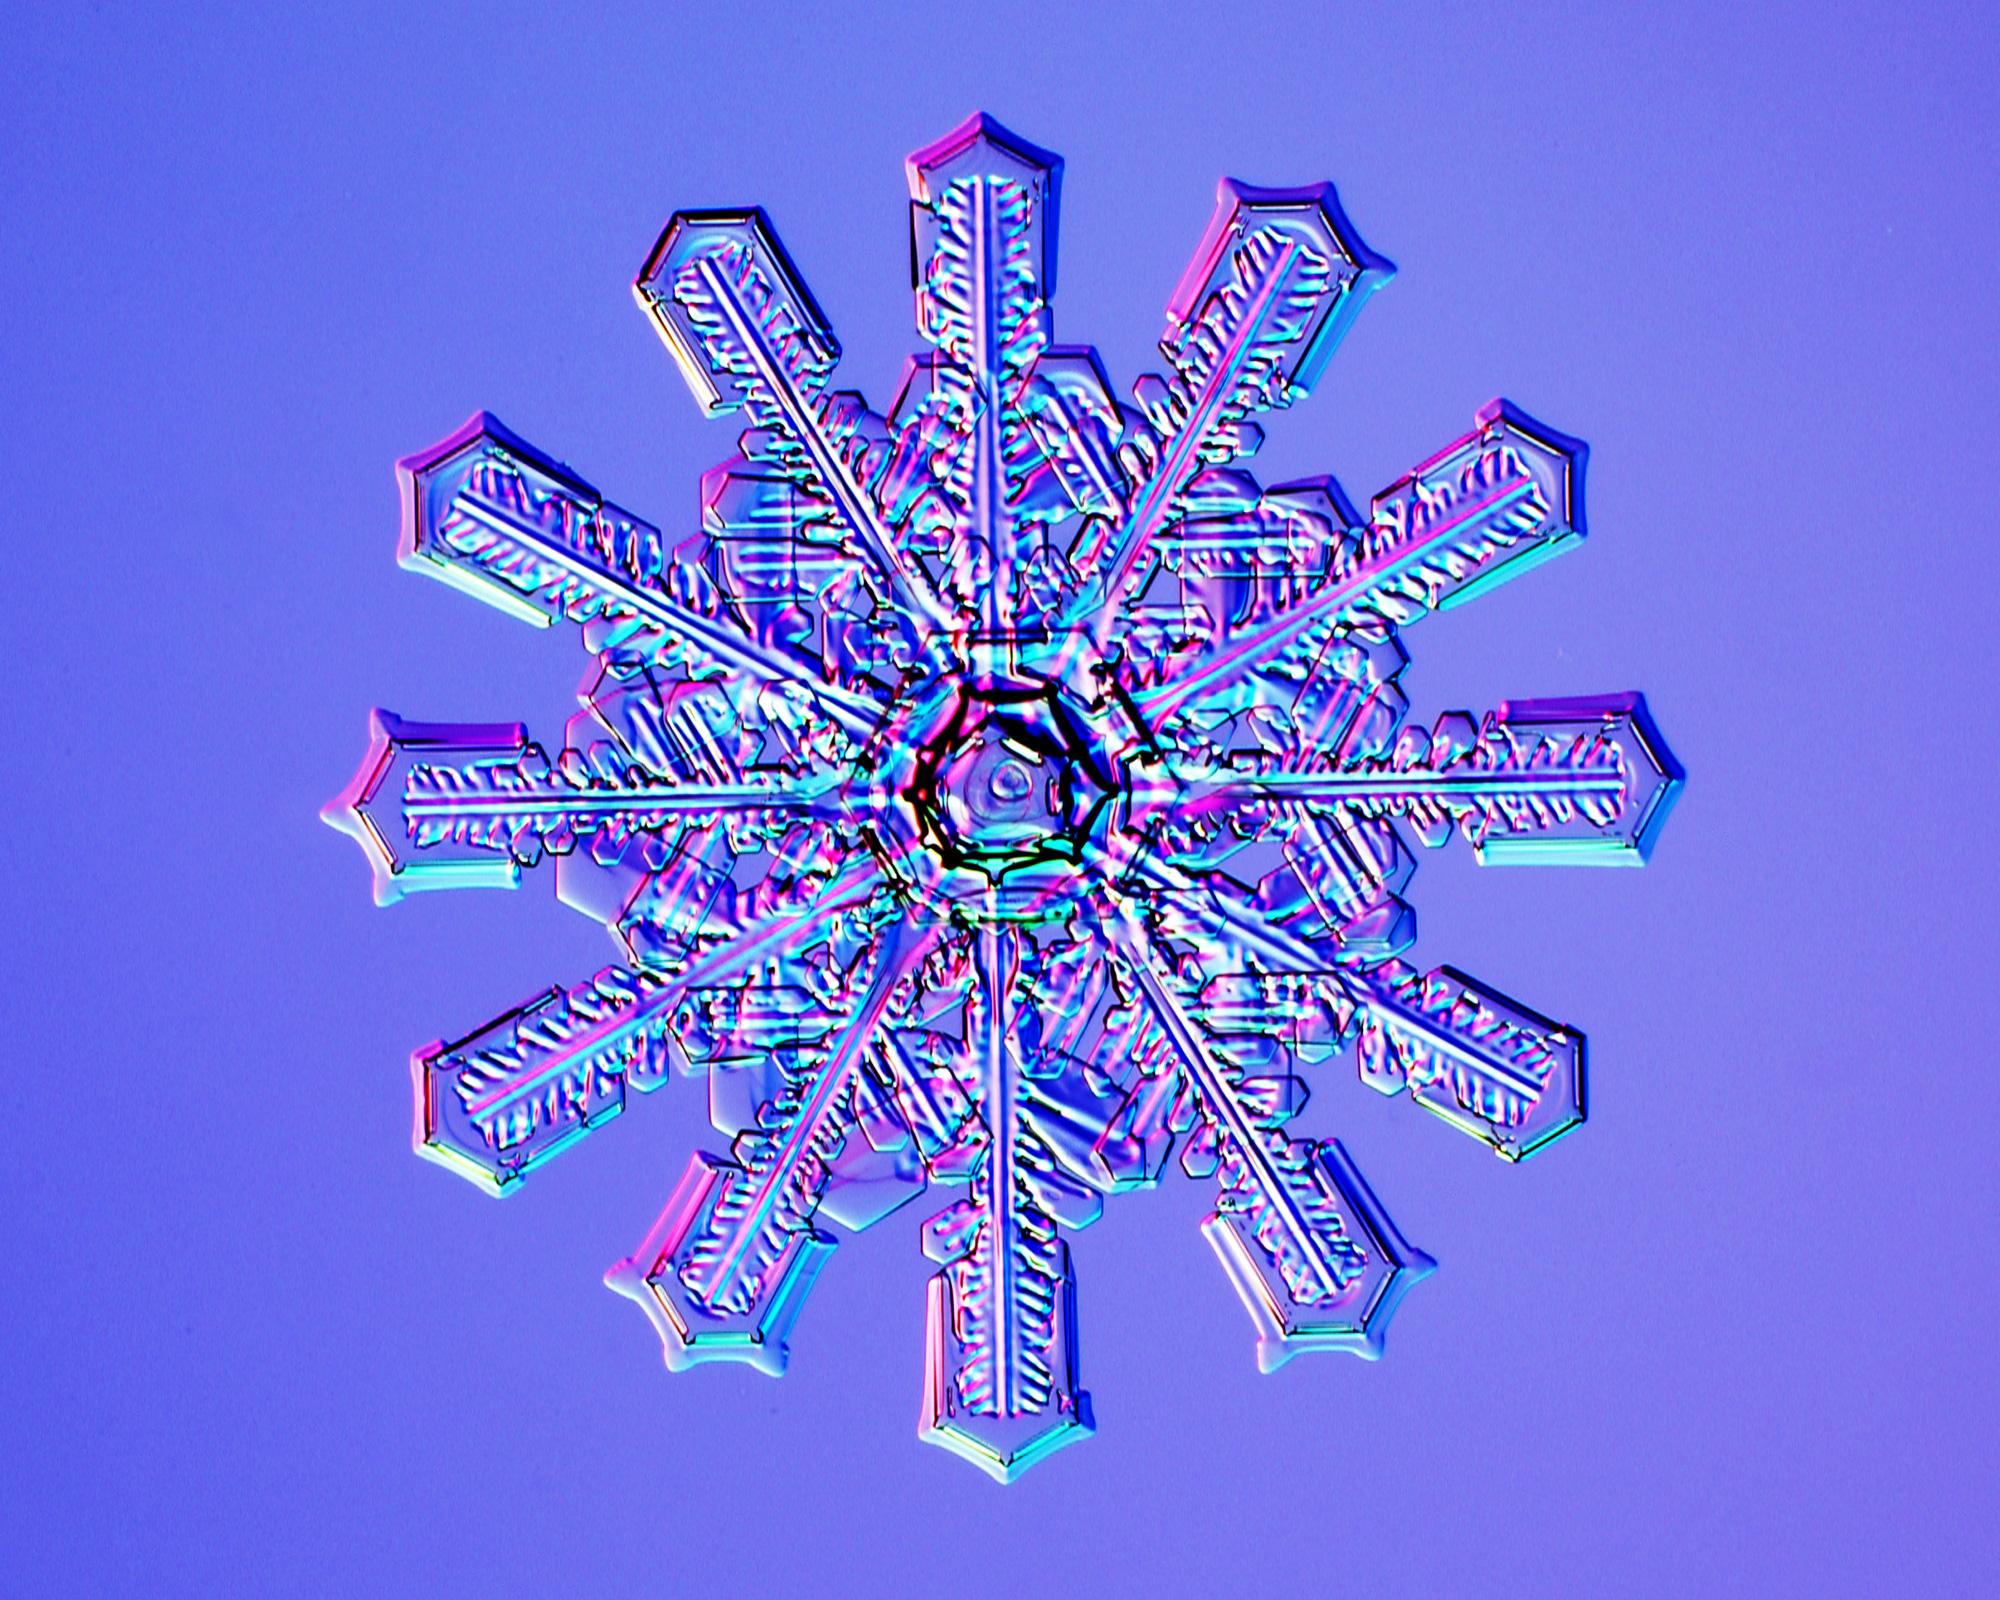 Set of 6! Winter white snowflakes on purple pencils